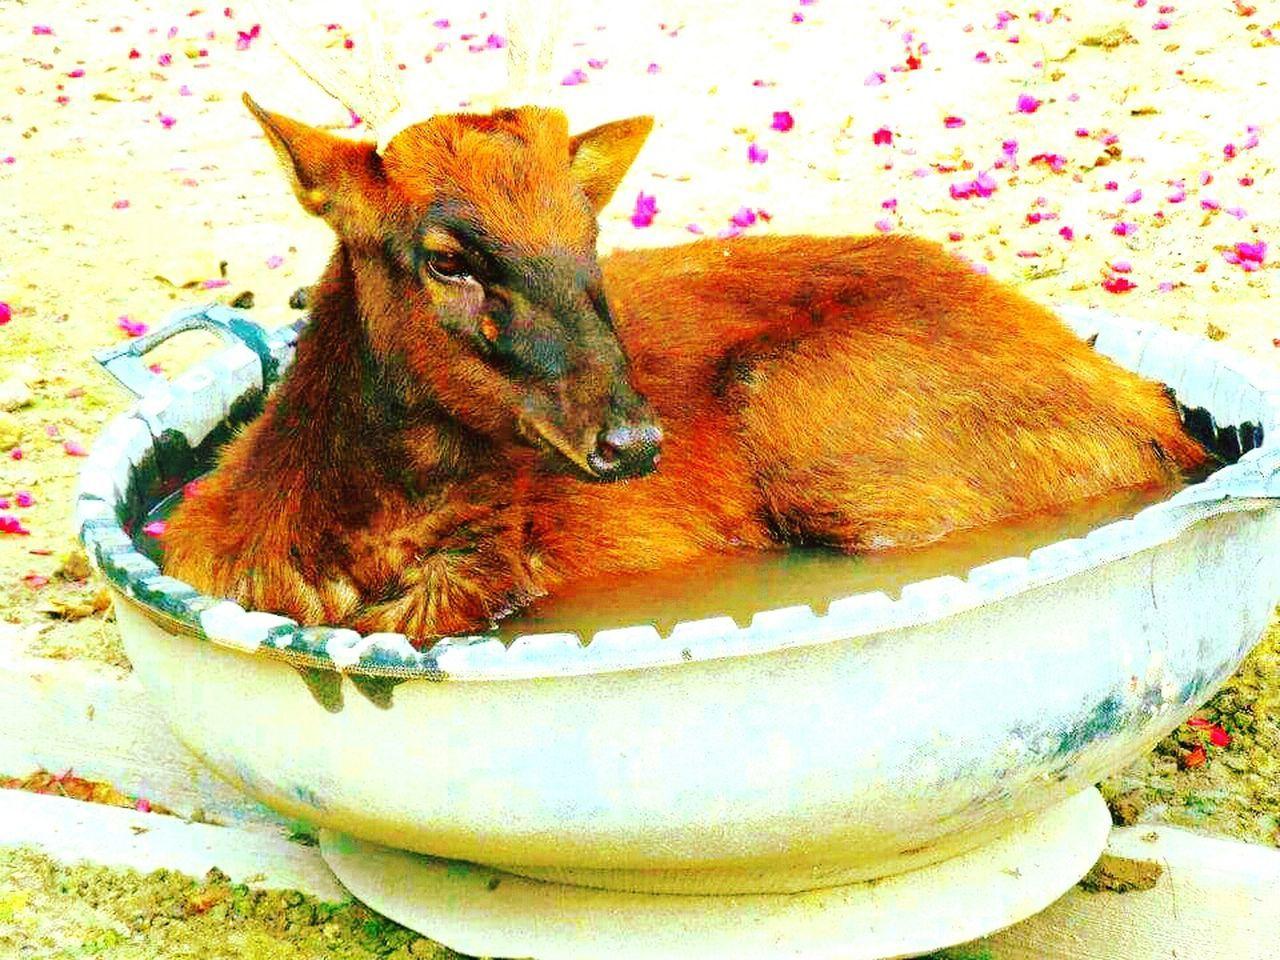 43 Golden Moments Fine Art Photography Deer Doe Nature Bath Tub Chilling Bathtime Bathing Relaxing Relaxing Deer Beutiful  Cute Potted Weird Showcase July